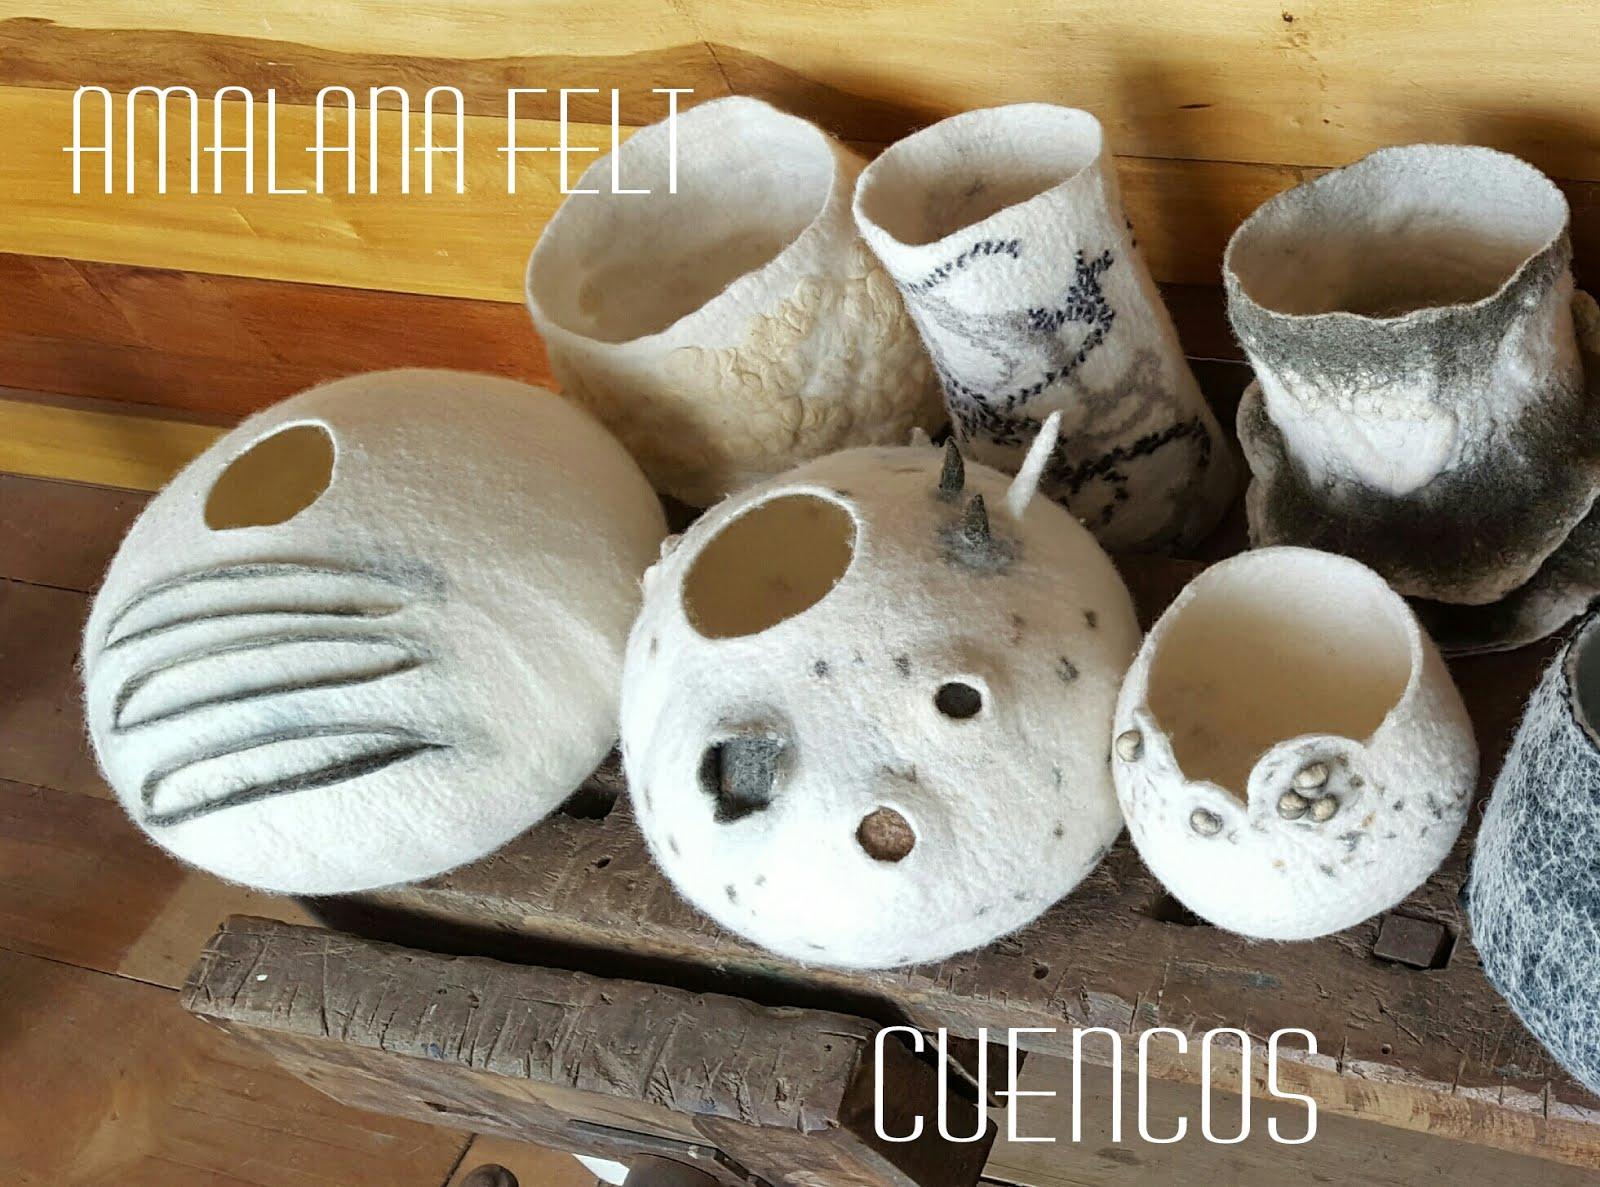 Amalana felt fieltro artesanal talleres de fieltro for Objetos hechos con marmol